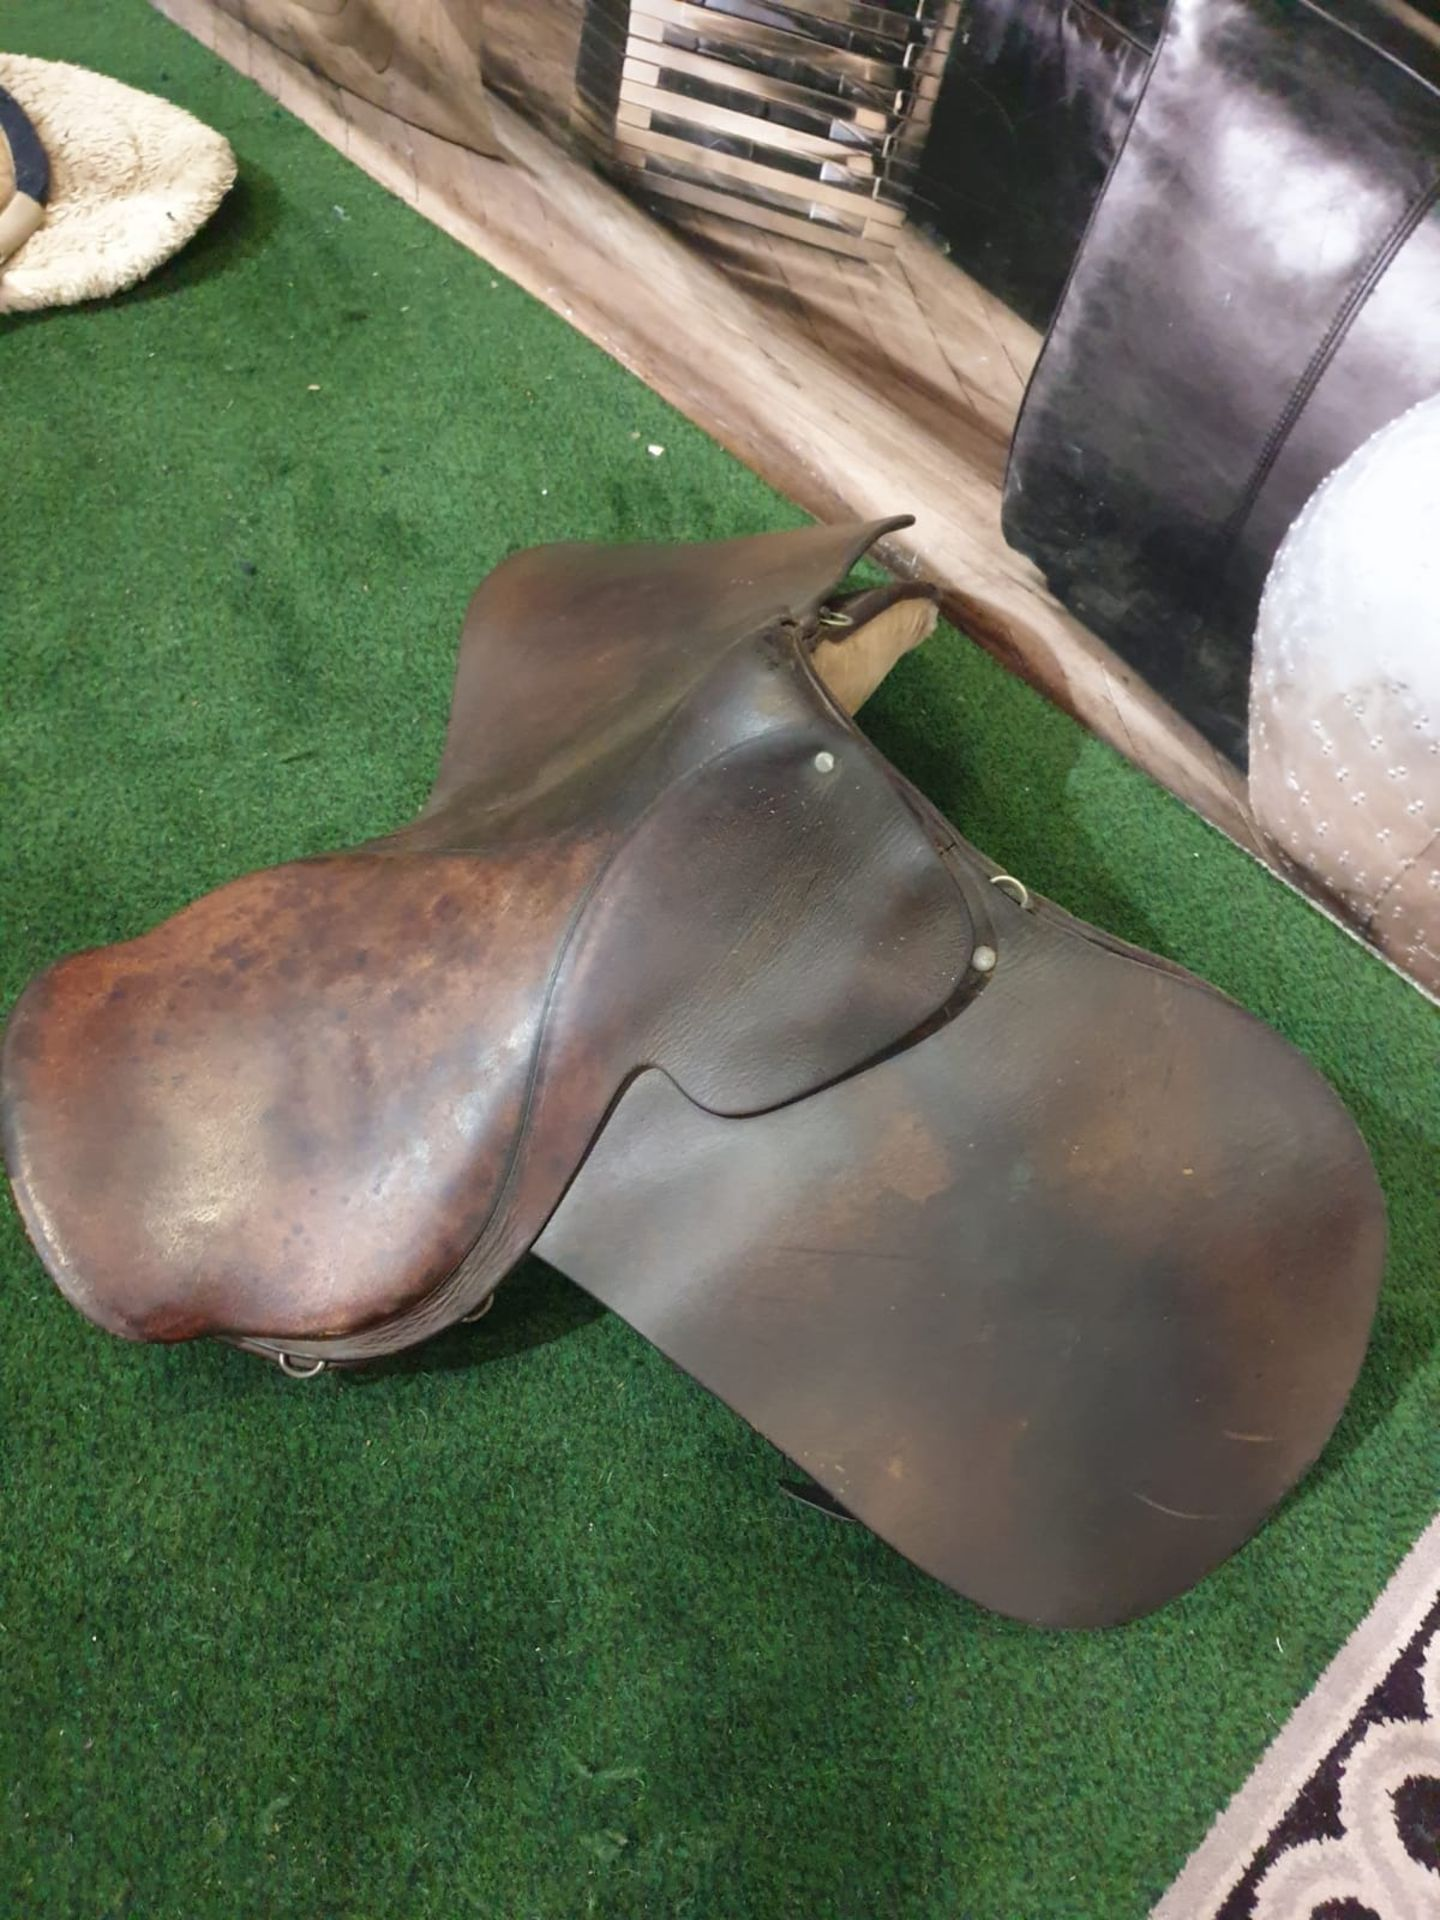 Vintage leather horses saddle. c. Circa 1960 Height 90 cm; Length 48 cm; Depth 45 cm - Image 3 of 4